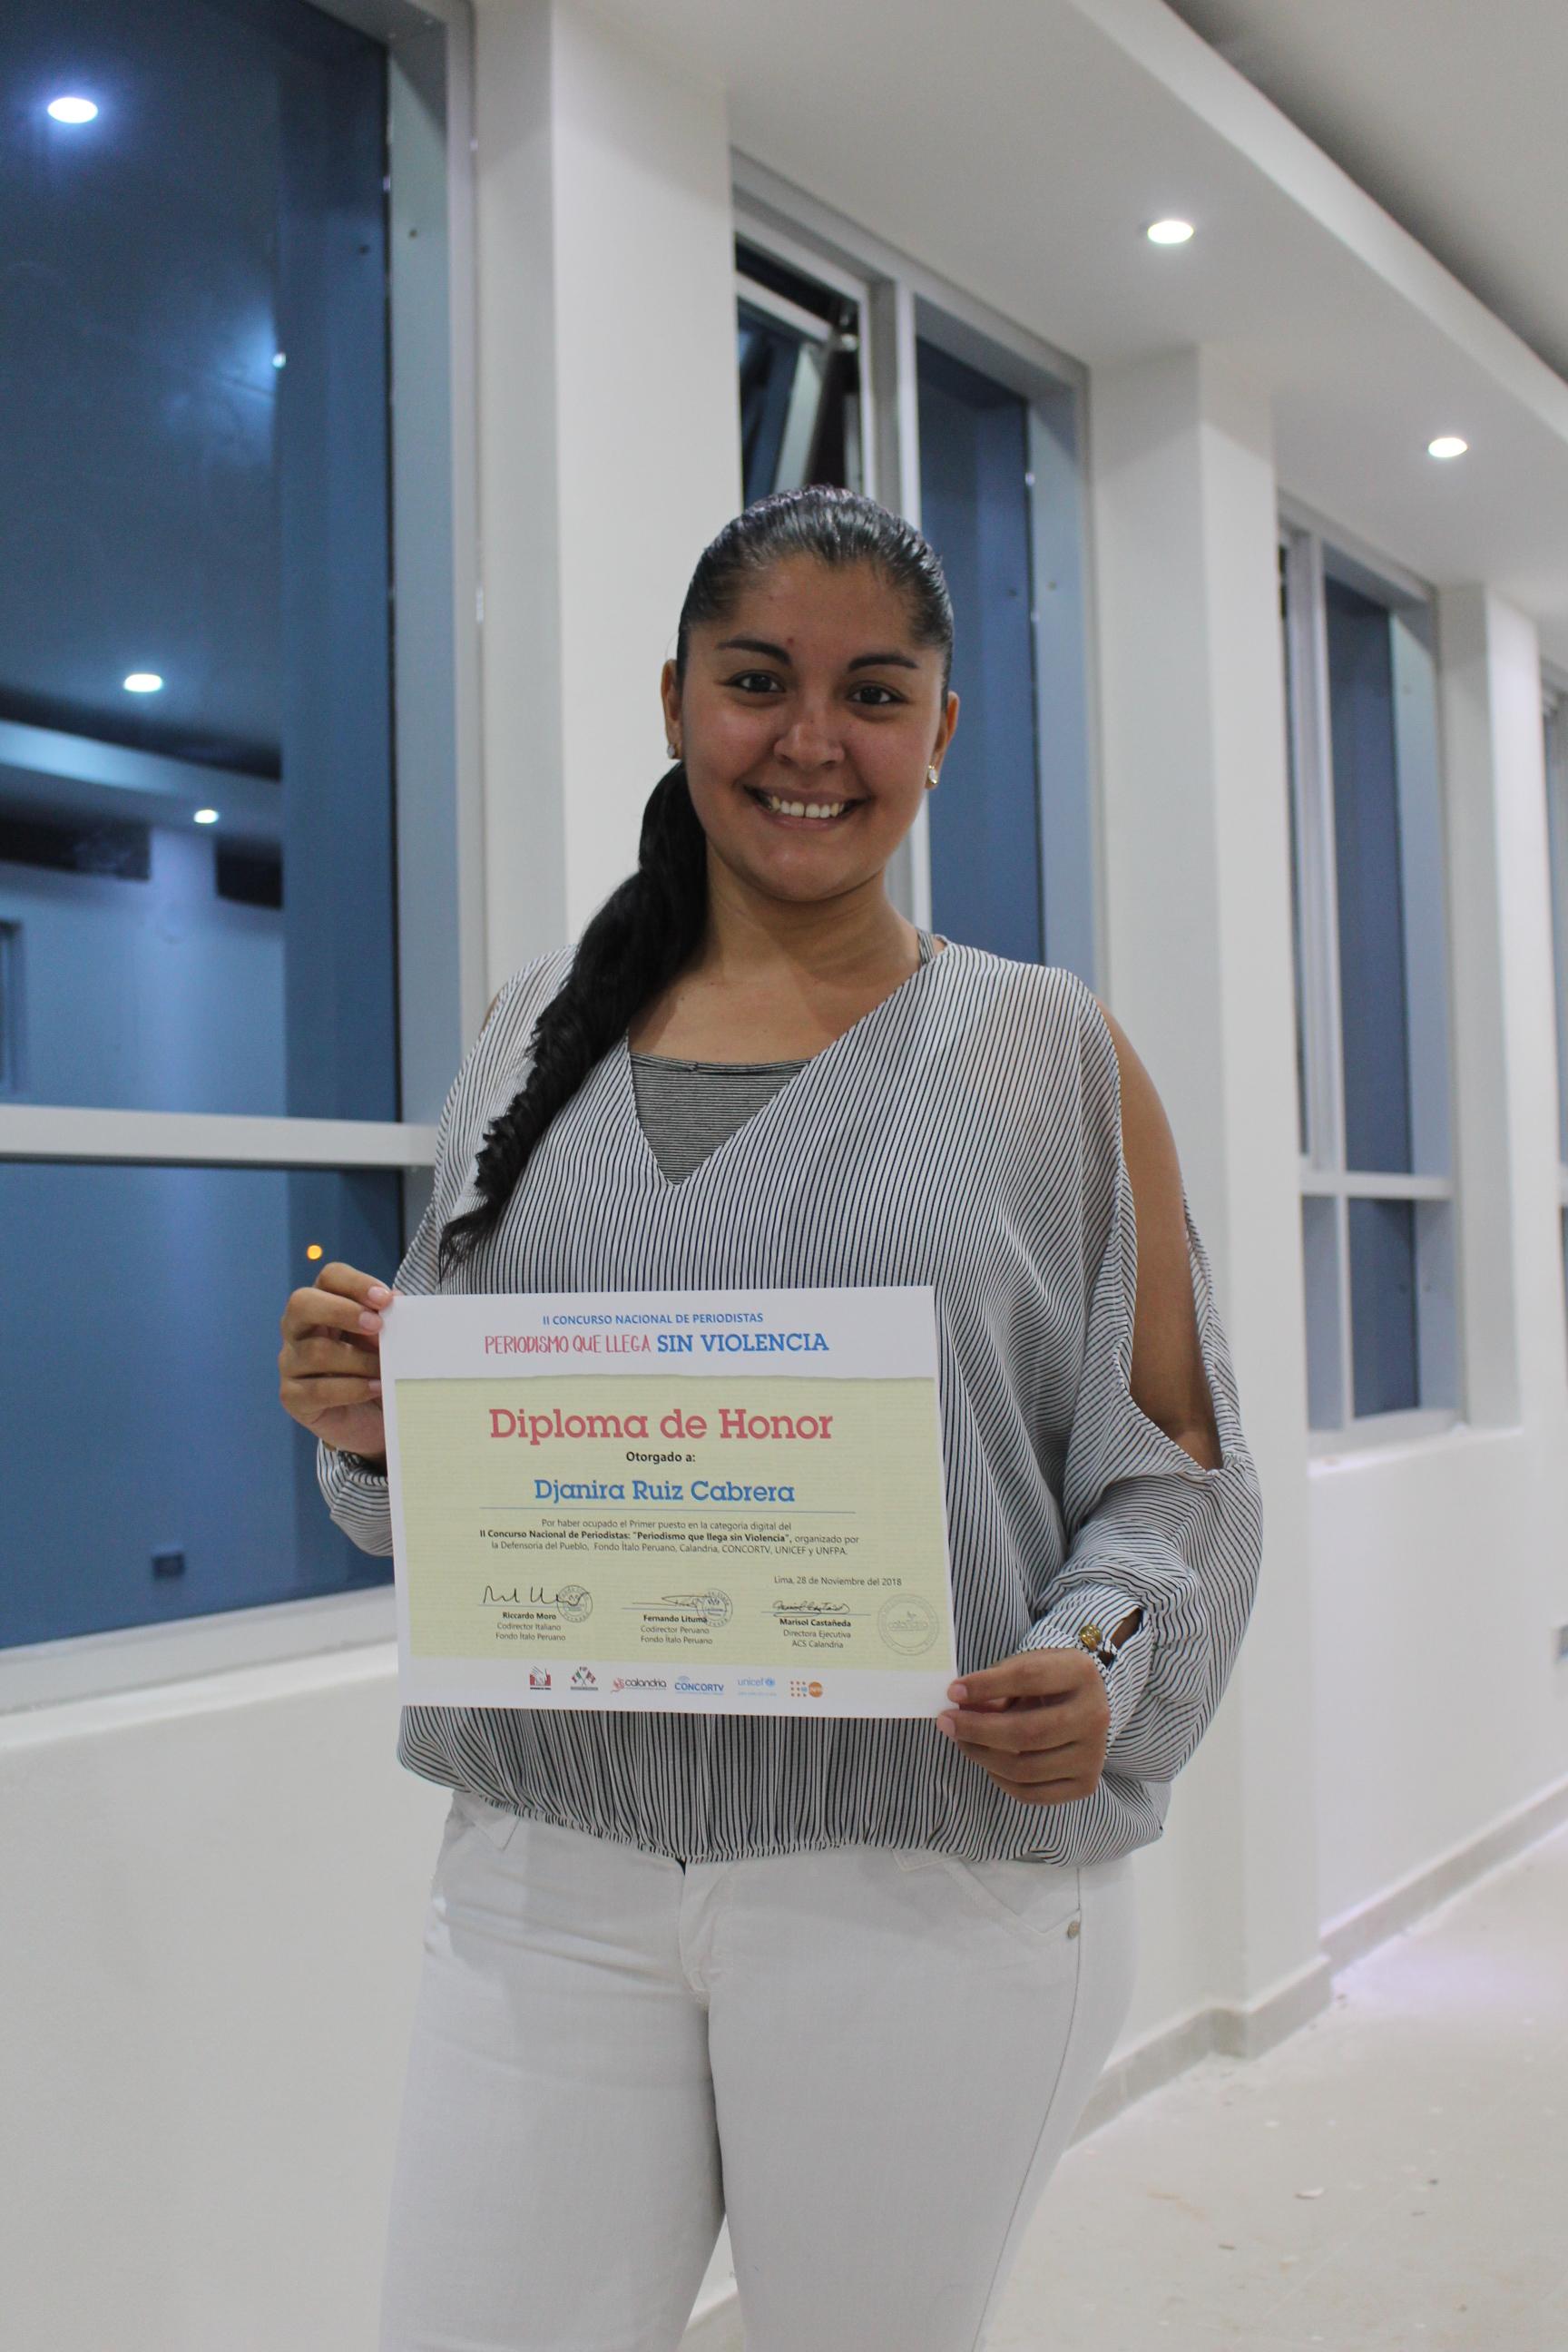 Djanira Ruiz Cabrera